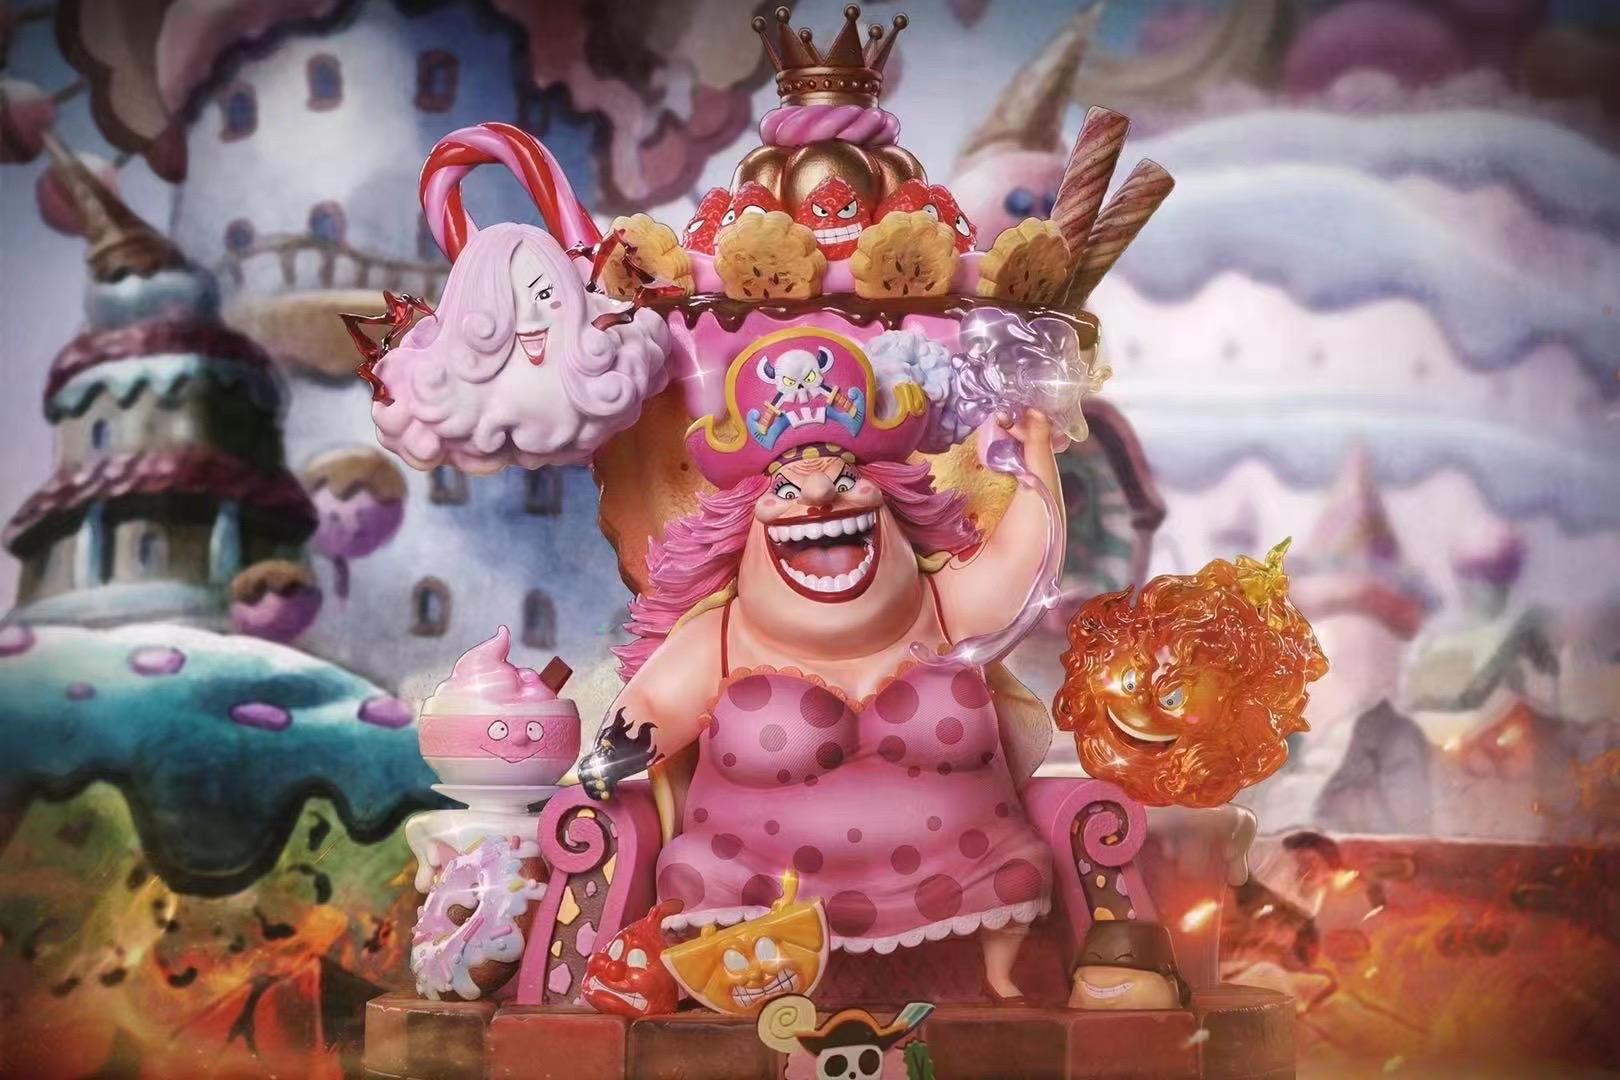 Big mom on throne บิ้กมัม by G5 Studio (มัดจำ)